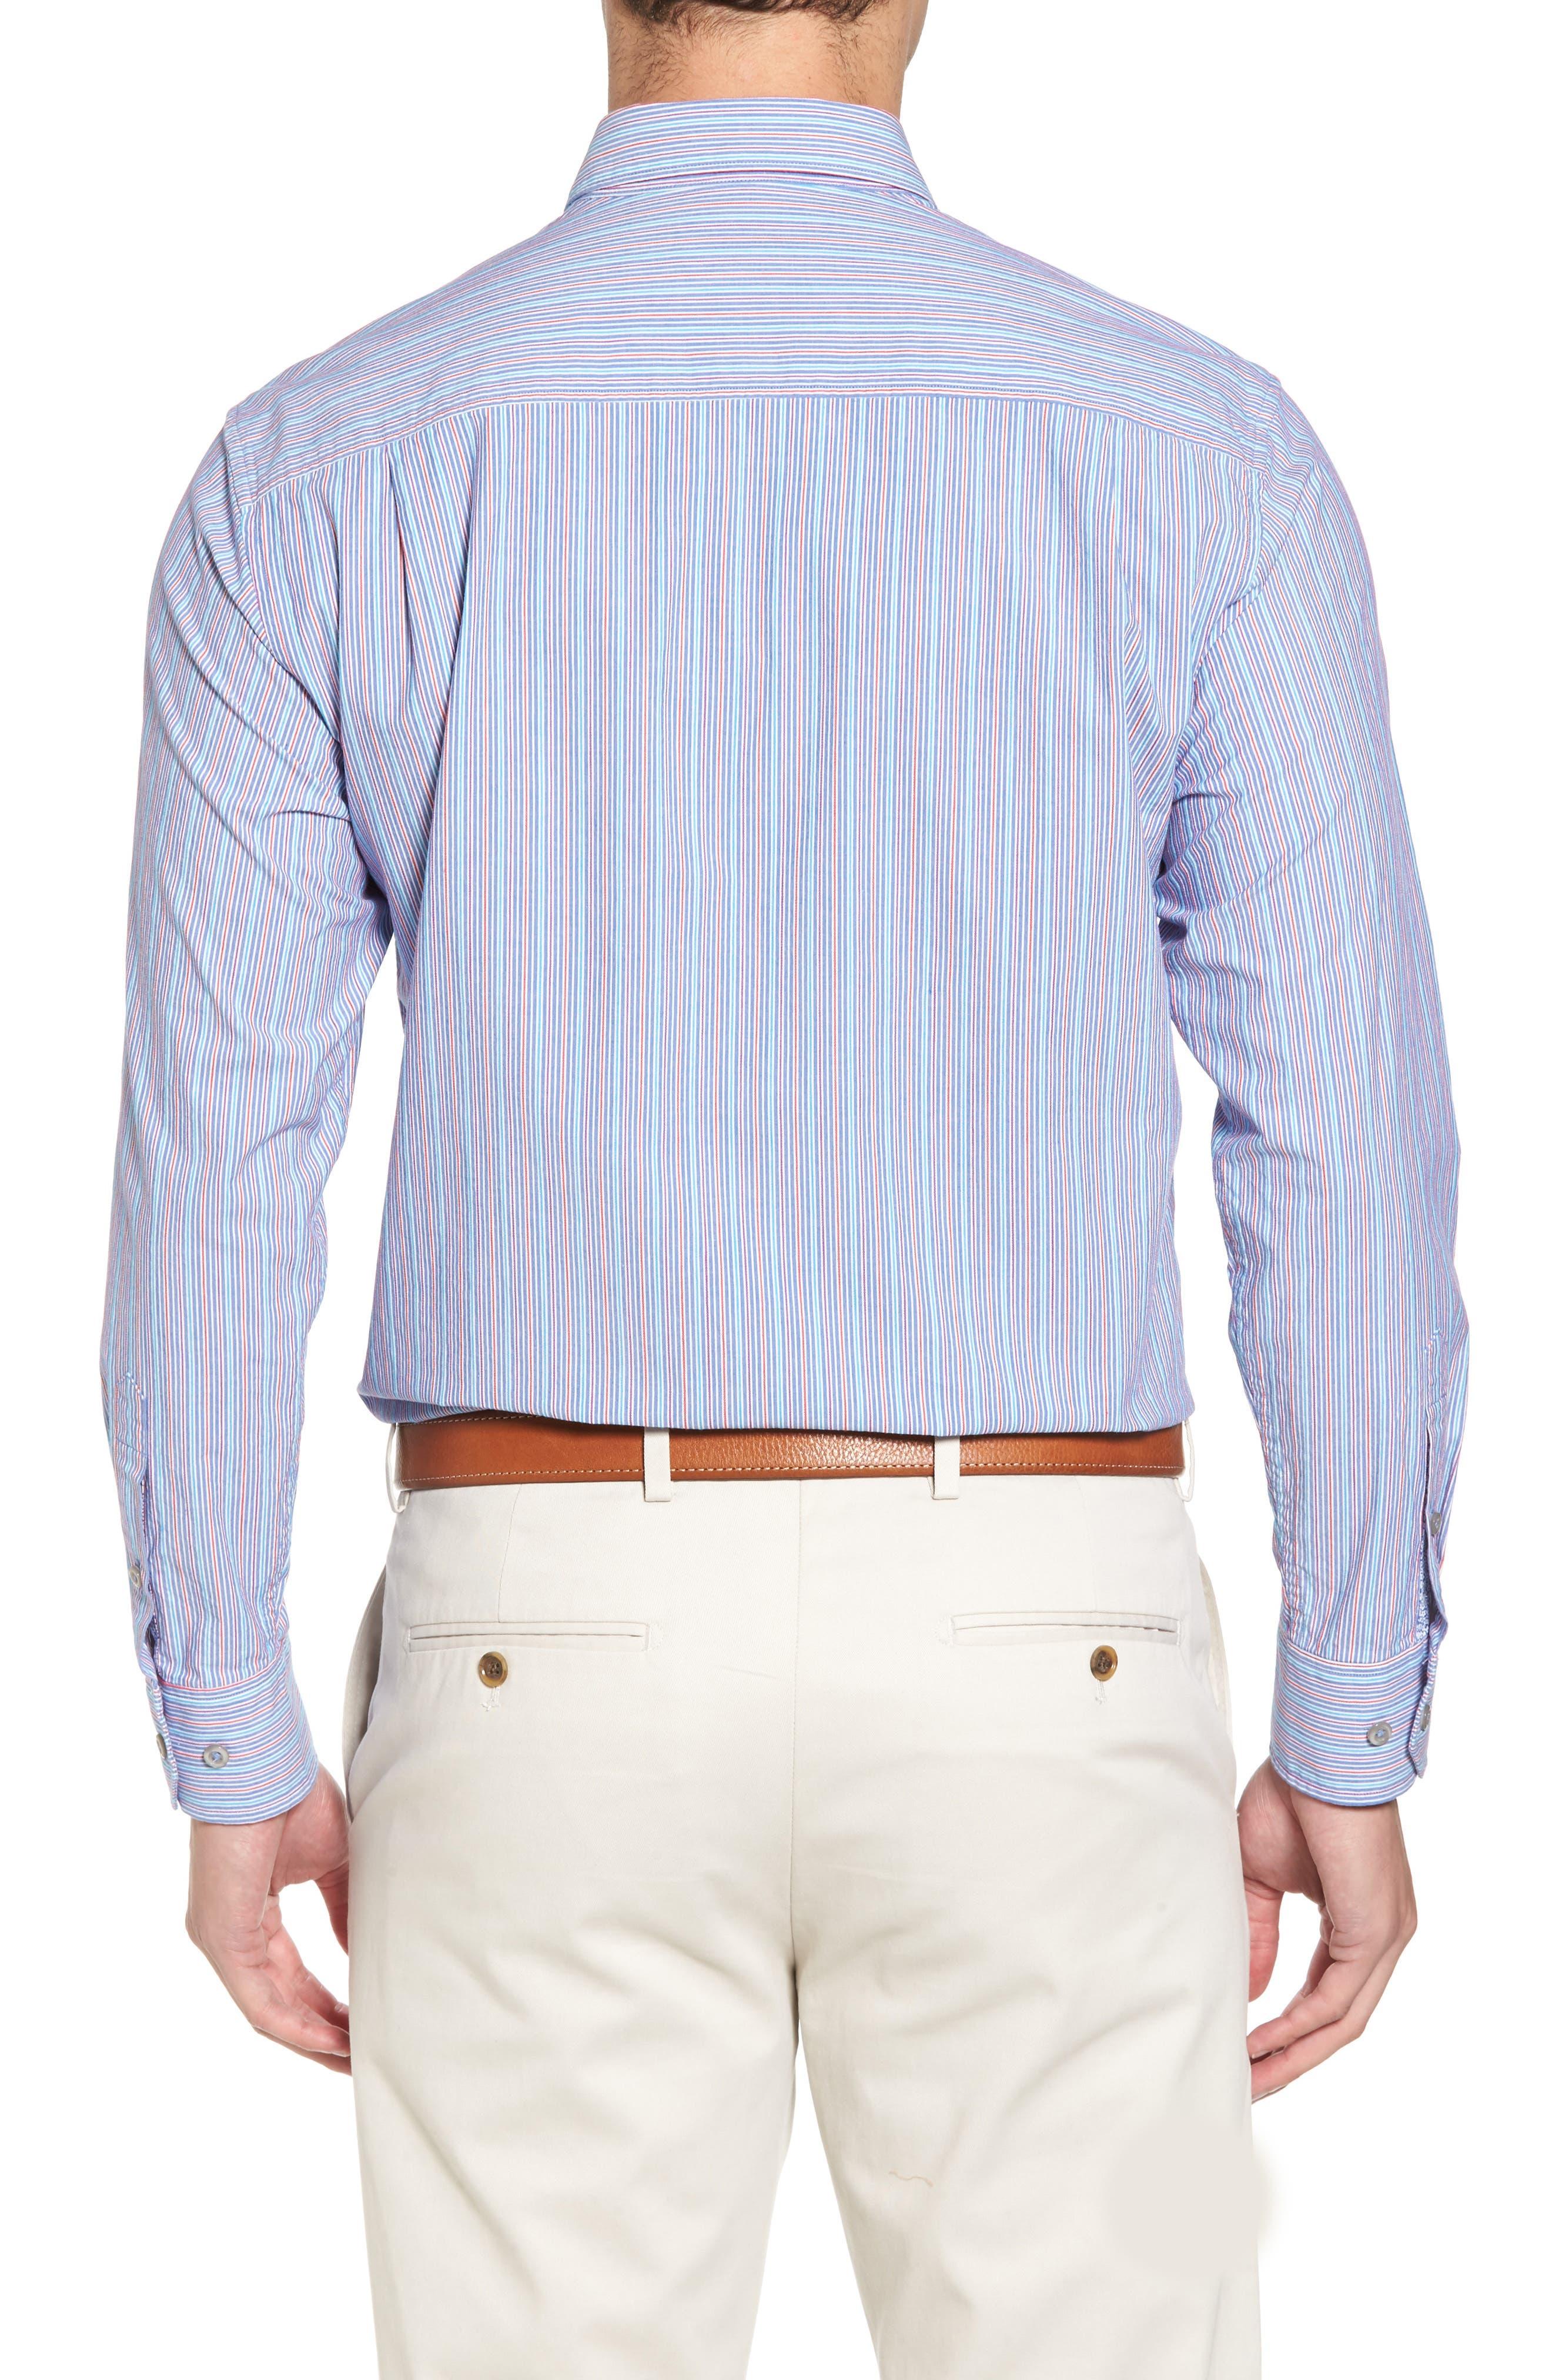 Tallahassee Cotton & Silk Blend Sport Shirt,                             Alternate thumbnail 2, color,                             Cobalt Sea